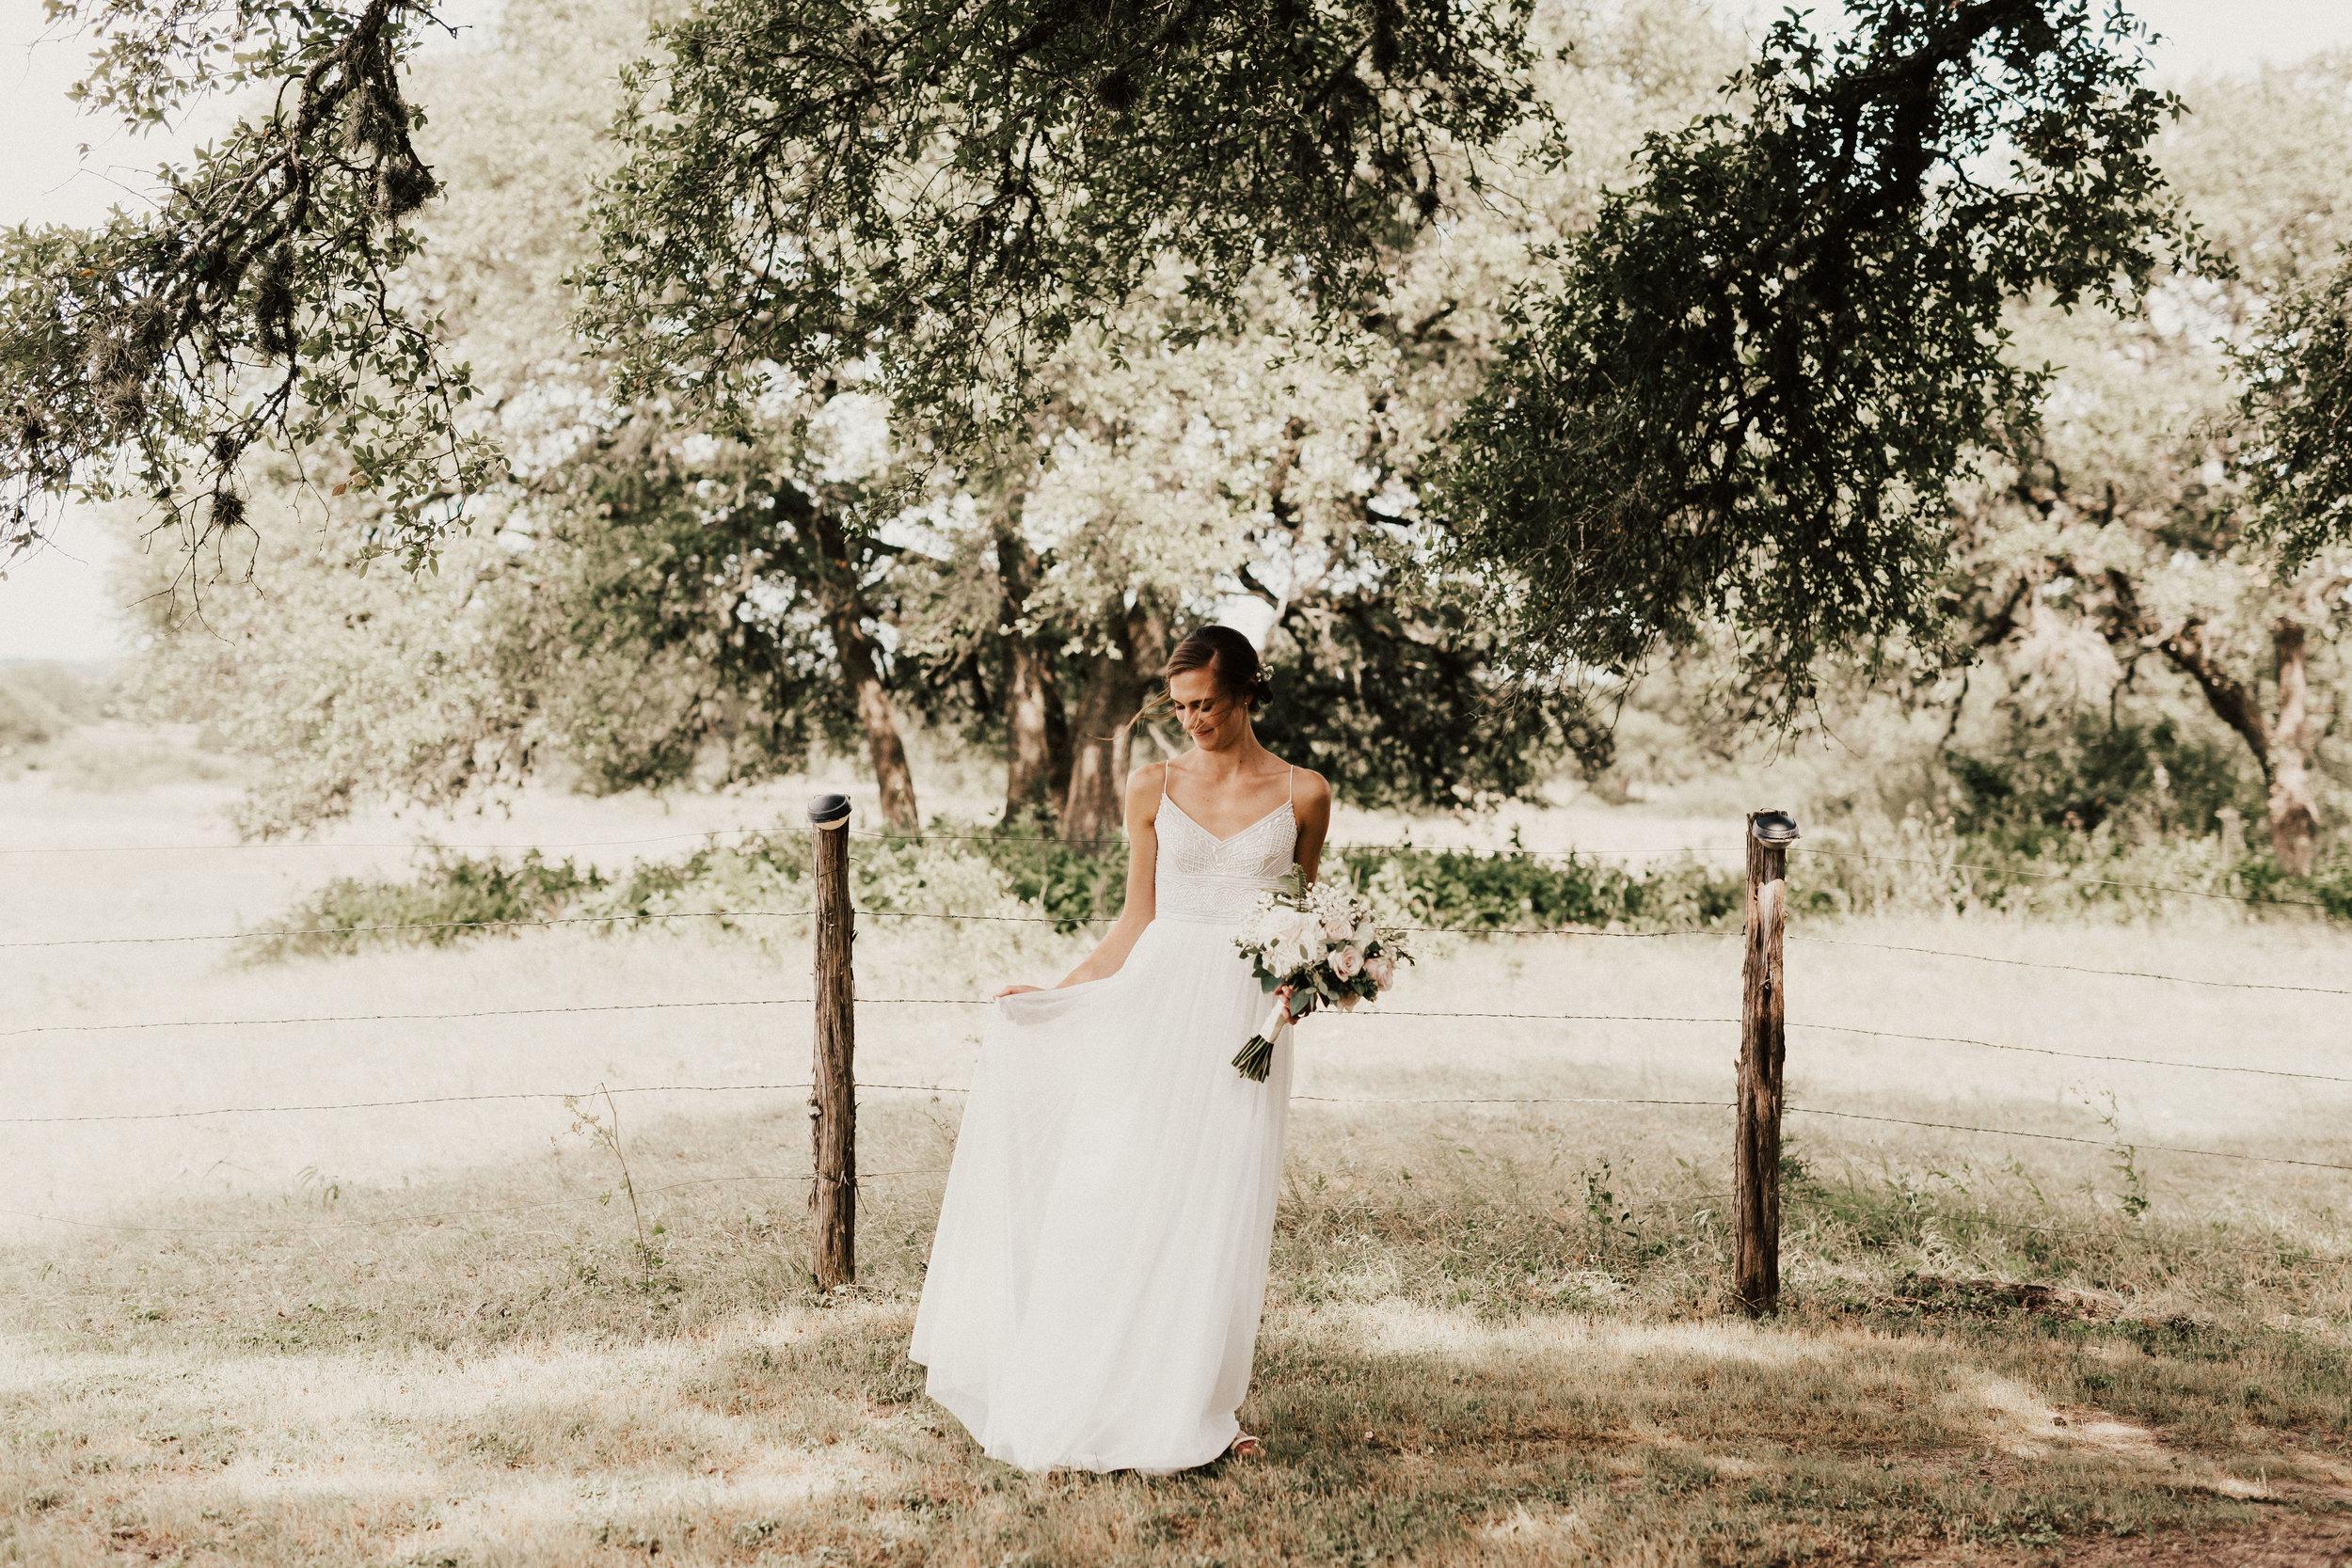 hannah-ben-stonehouse-villa-austin-texas-wedding-photographer-251.jpg